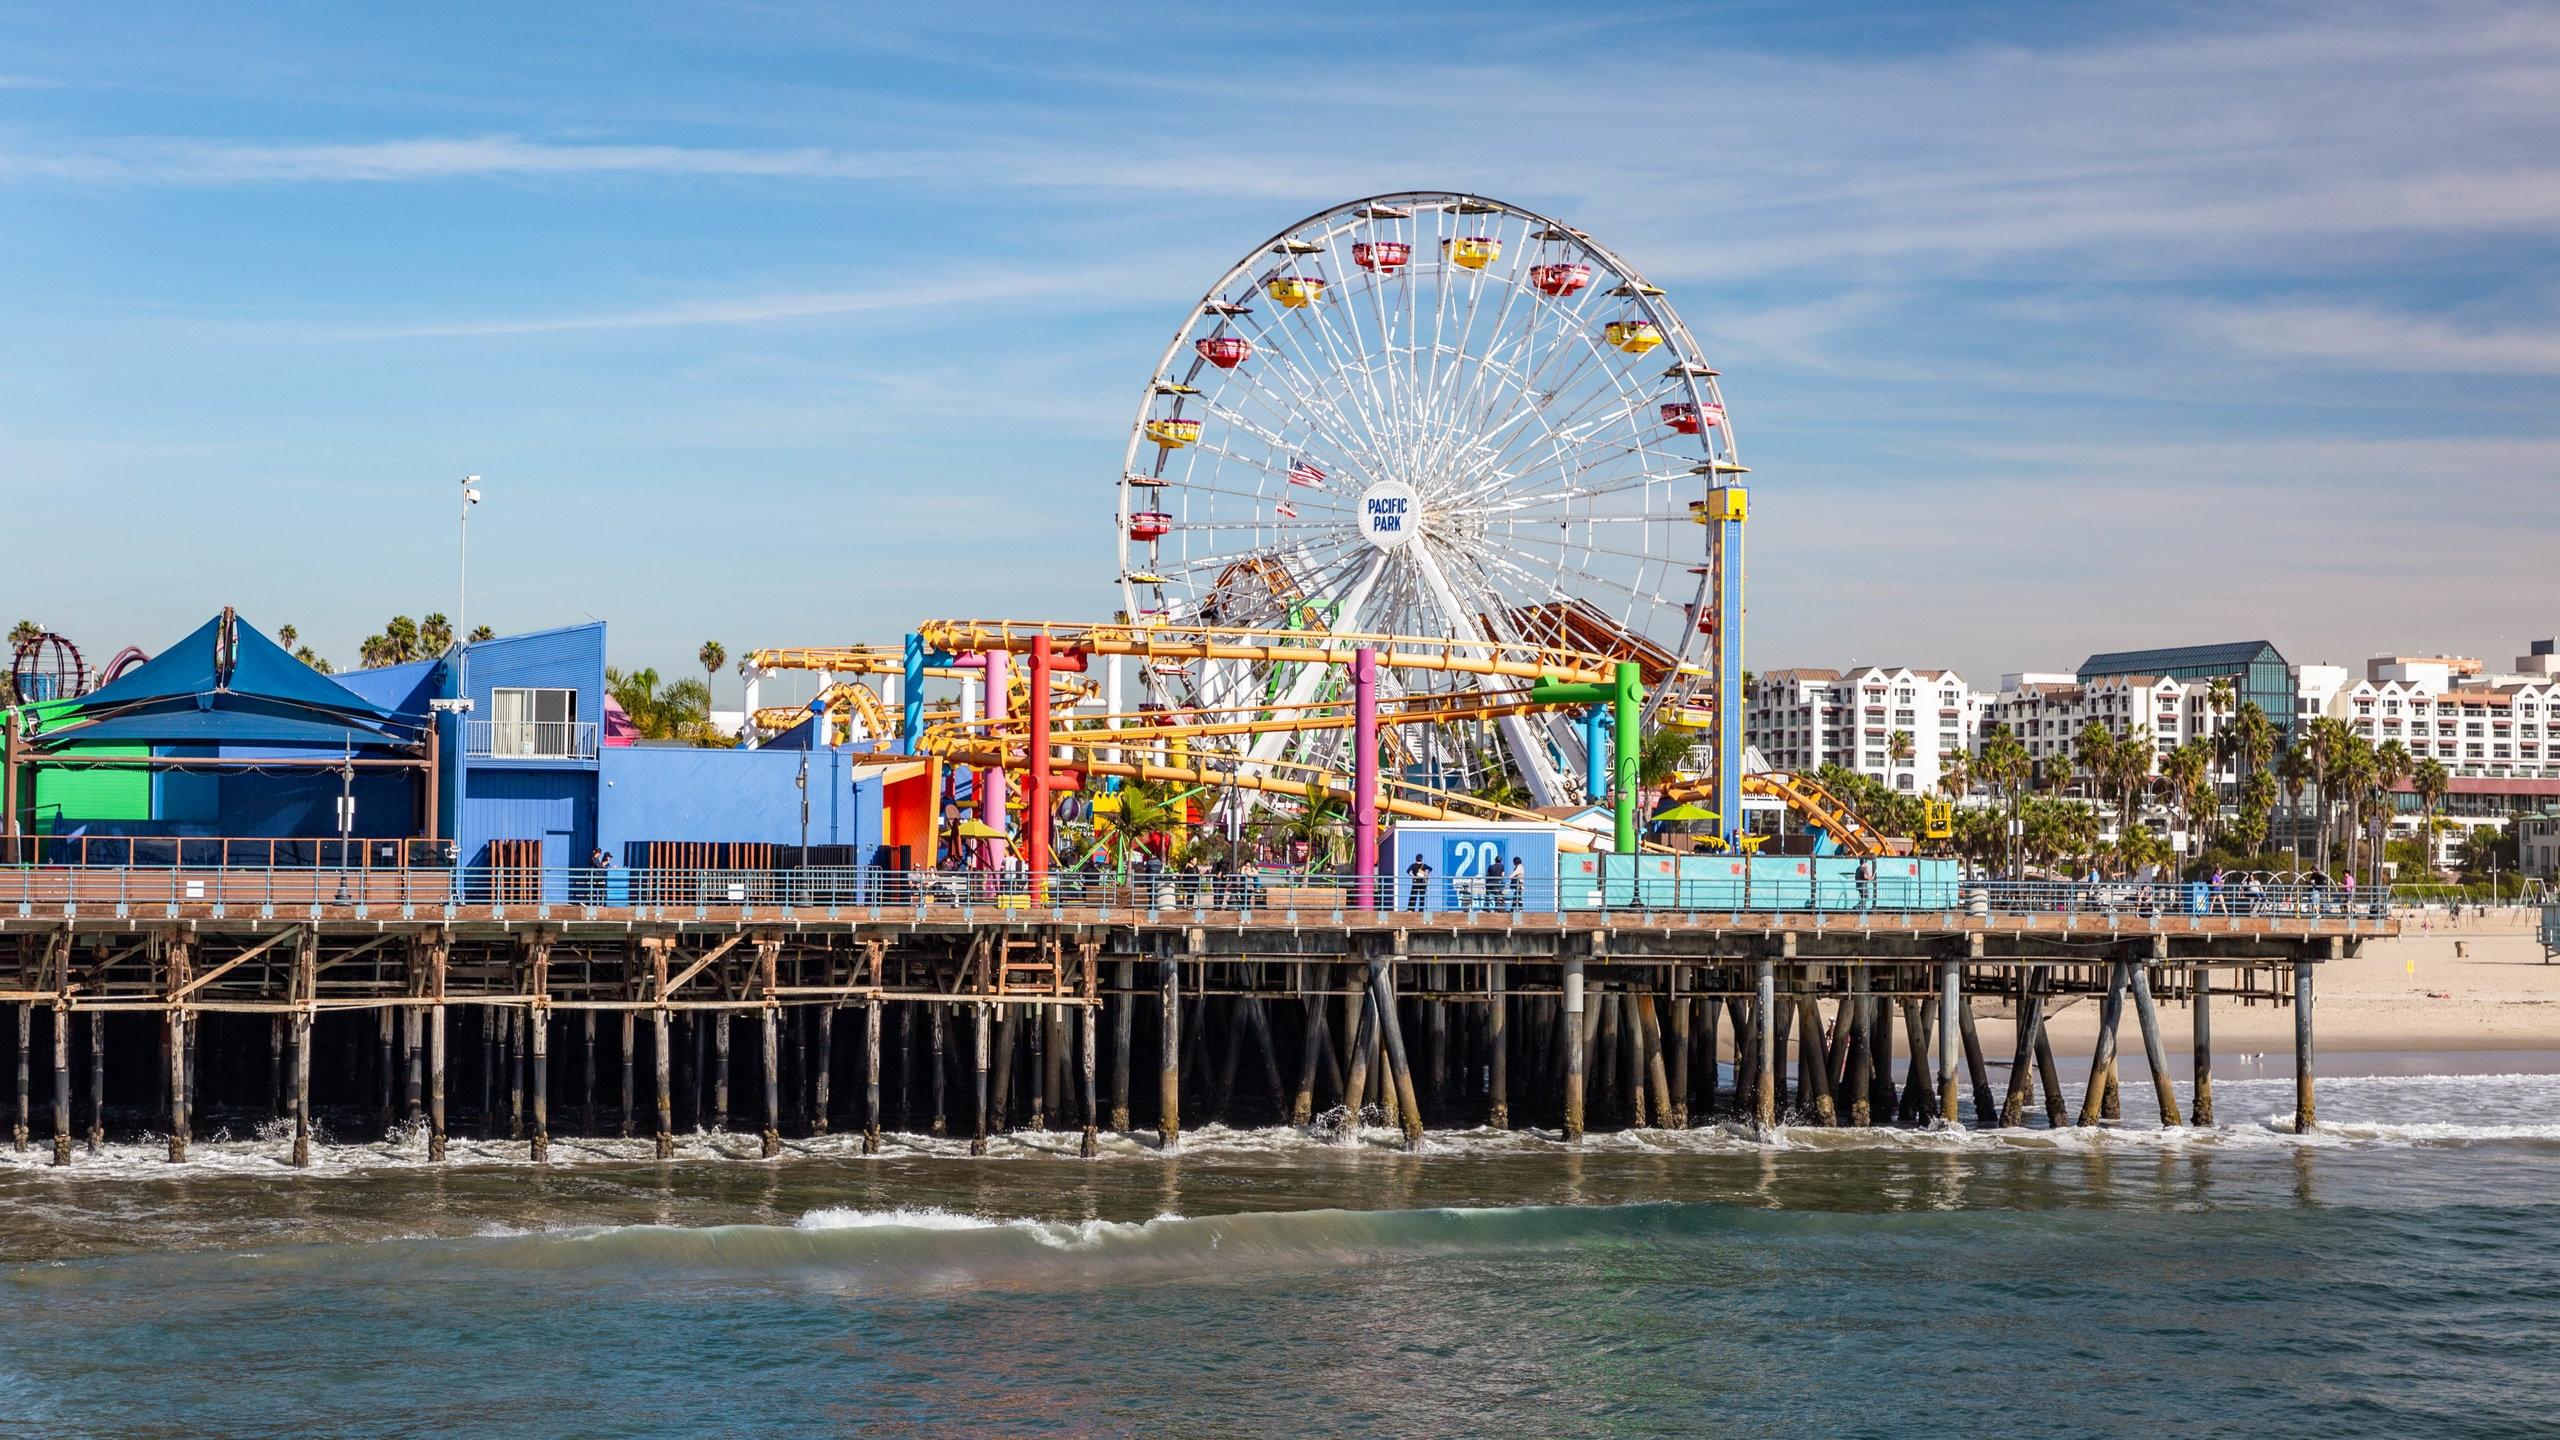 Santa Monica, California, United States of America